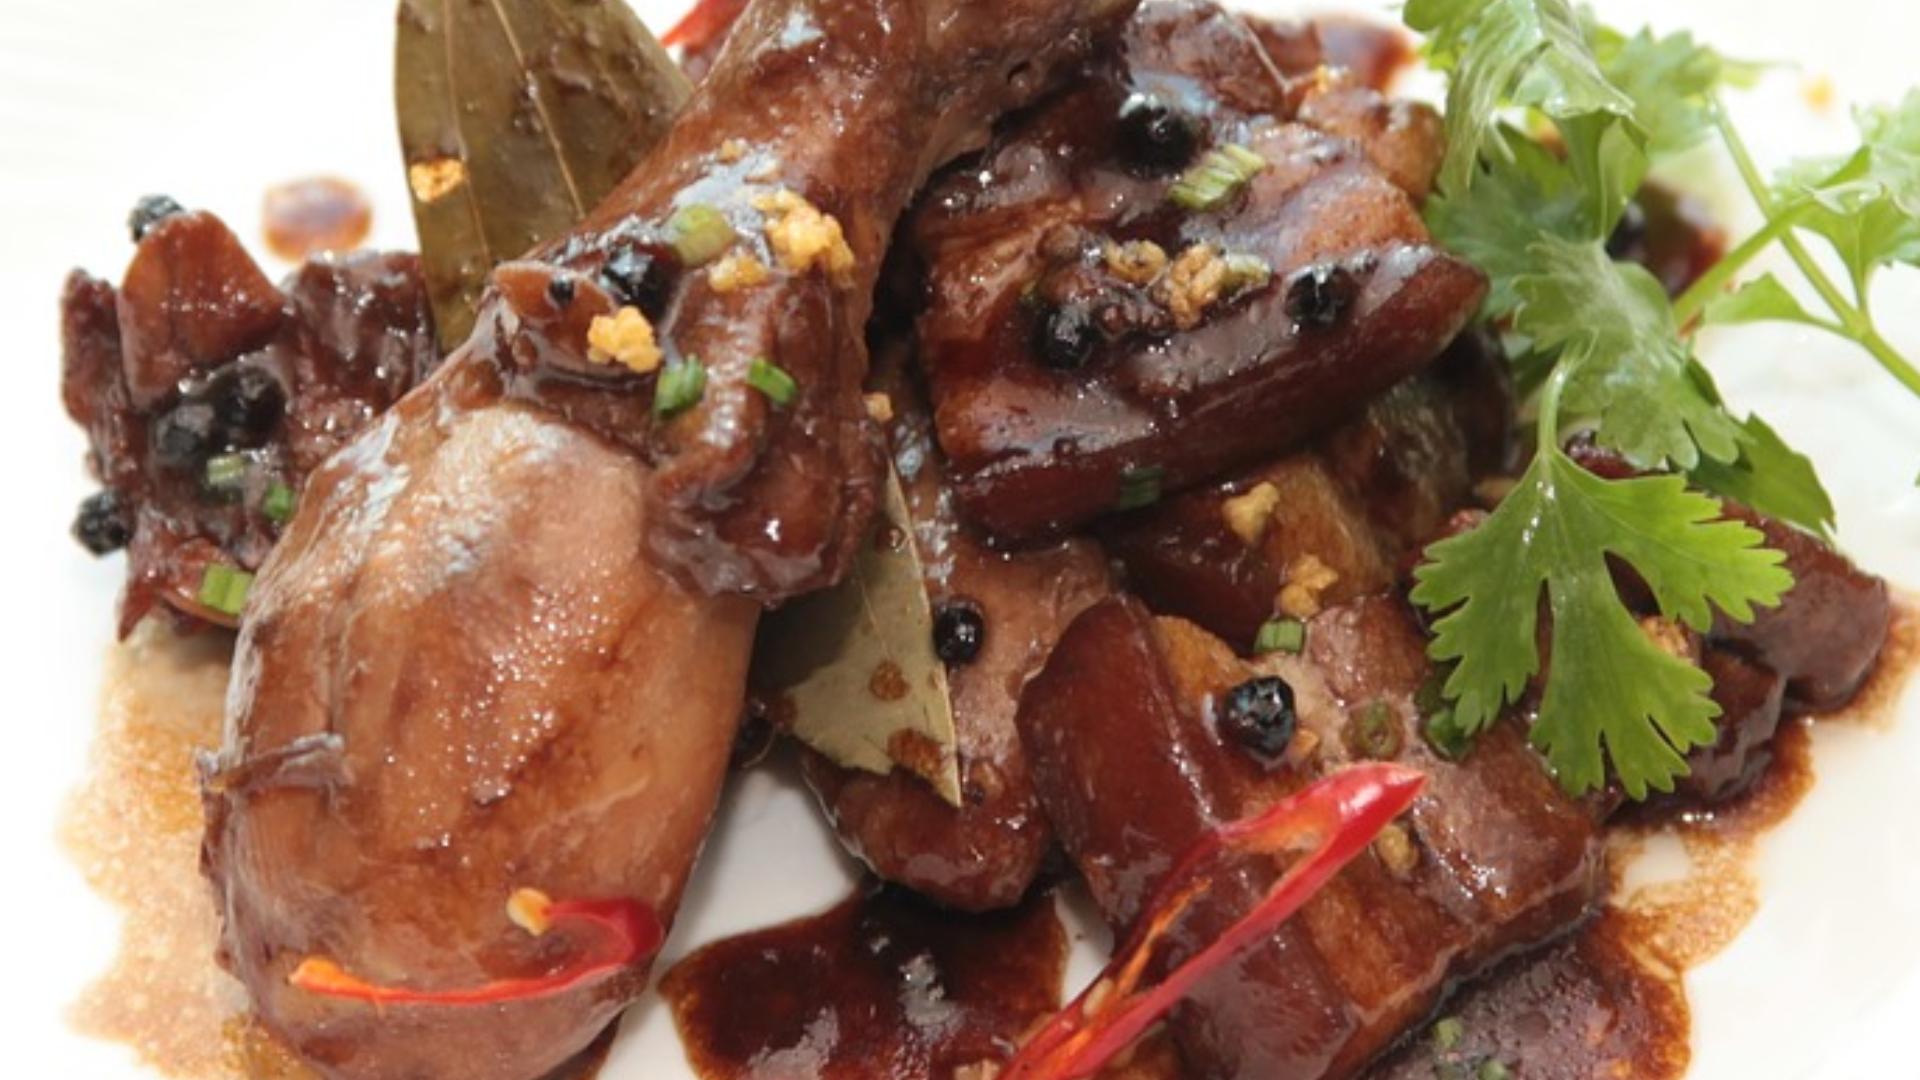 Chicken Adobo Panlasang Pinoy Facts & Recipes